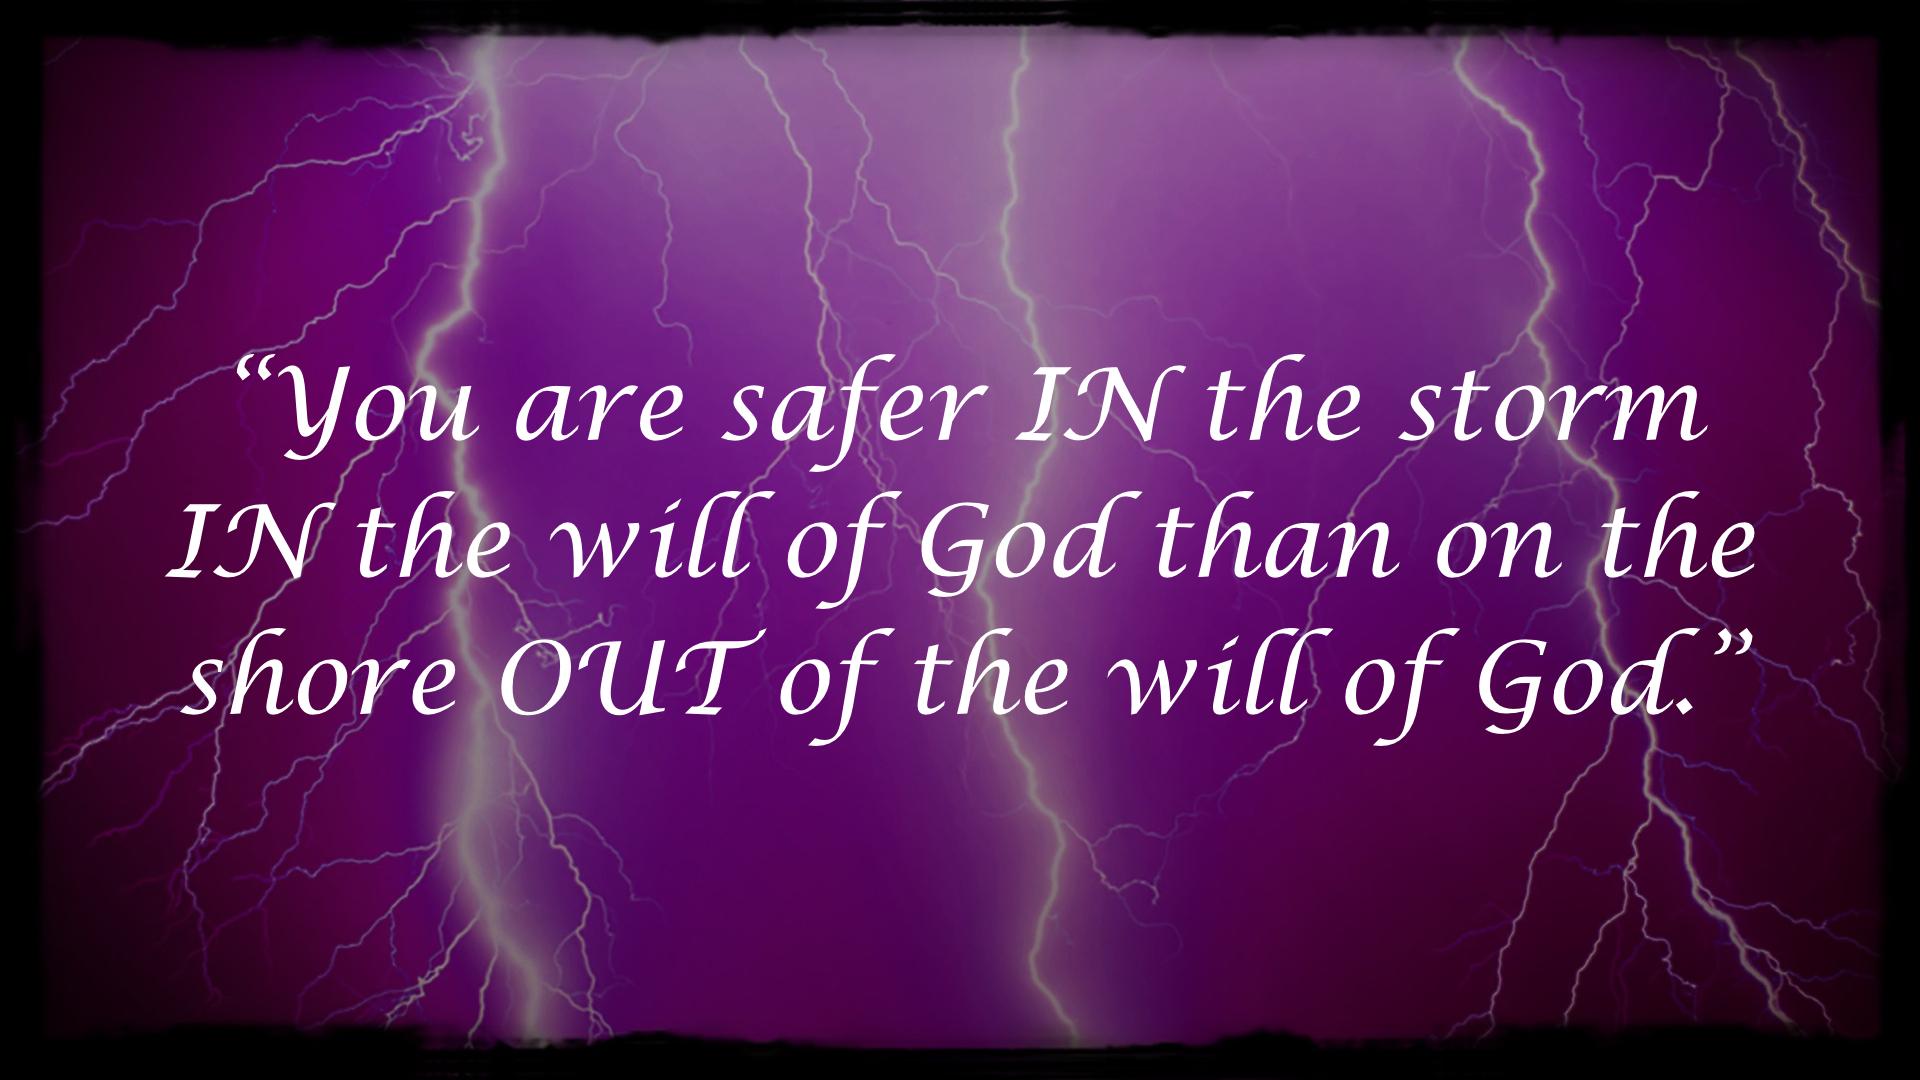 Safer in the storm.jpg.001